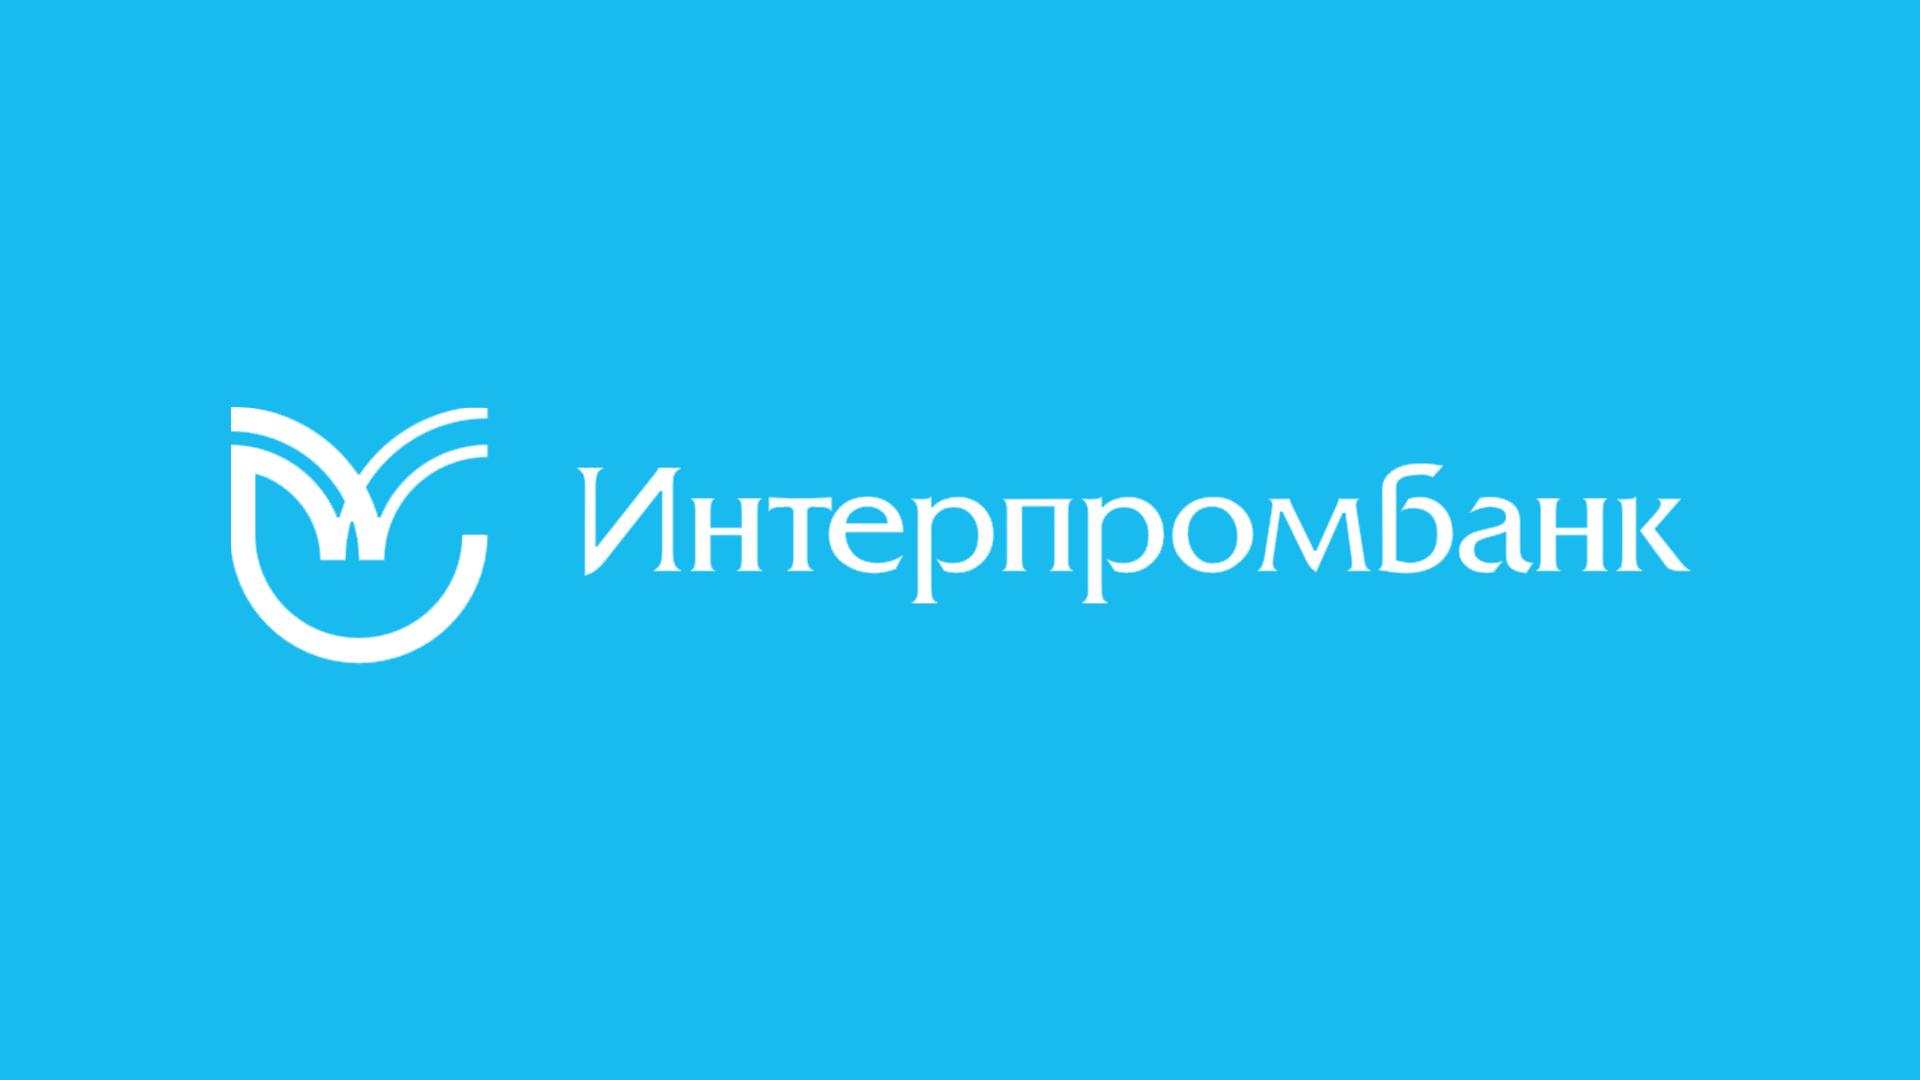 kredit-po-dvum-dokumentam_9